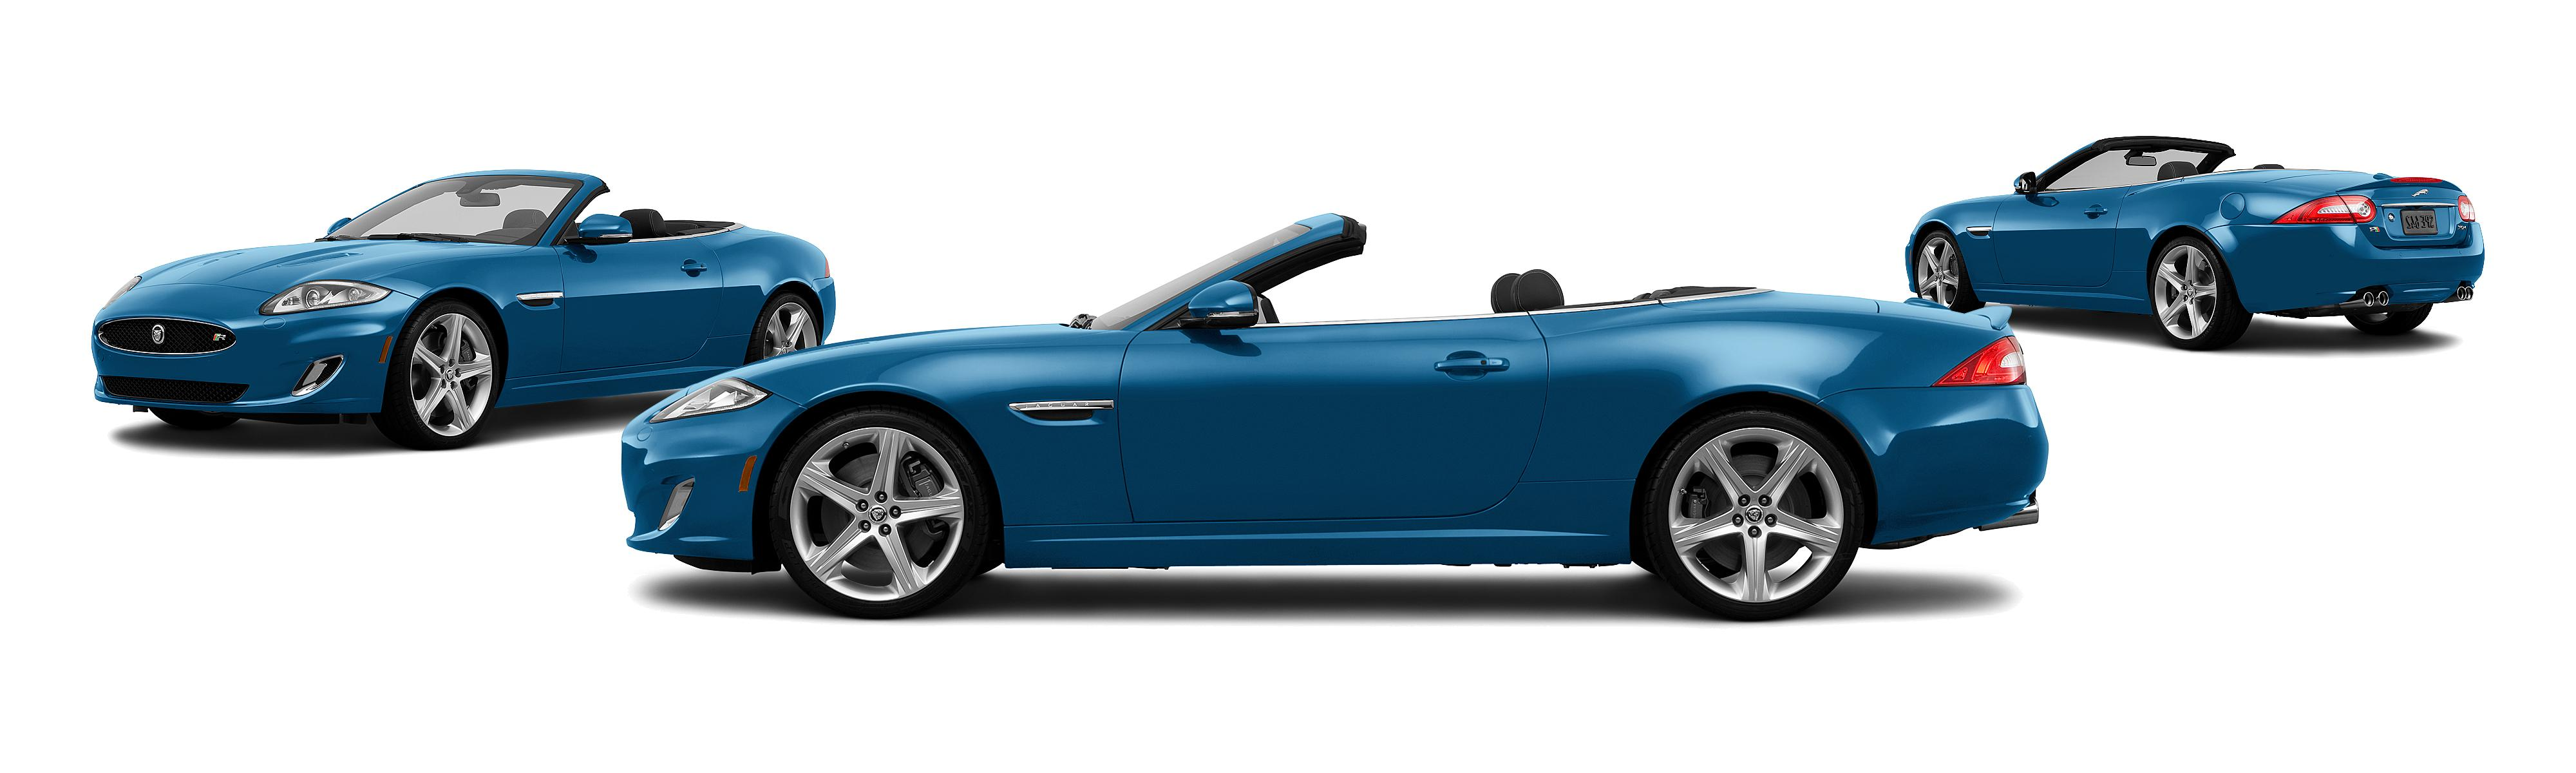 2013 Jaguar XK 2dr Convertible Research GrooveCar